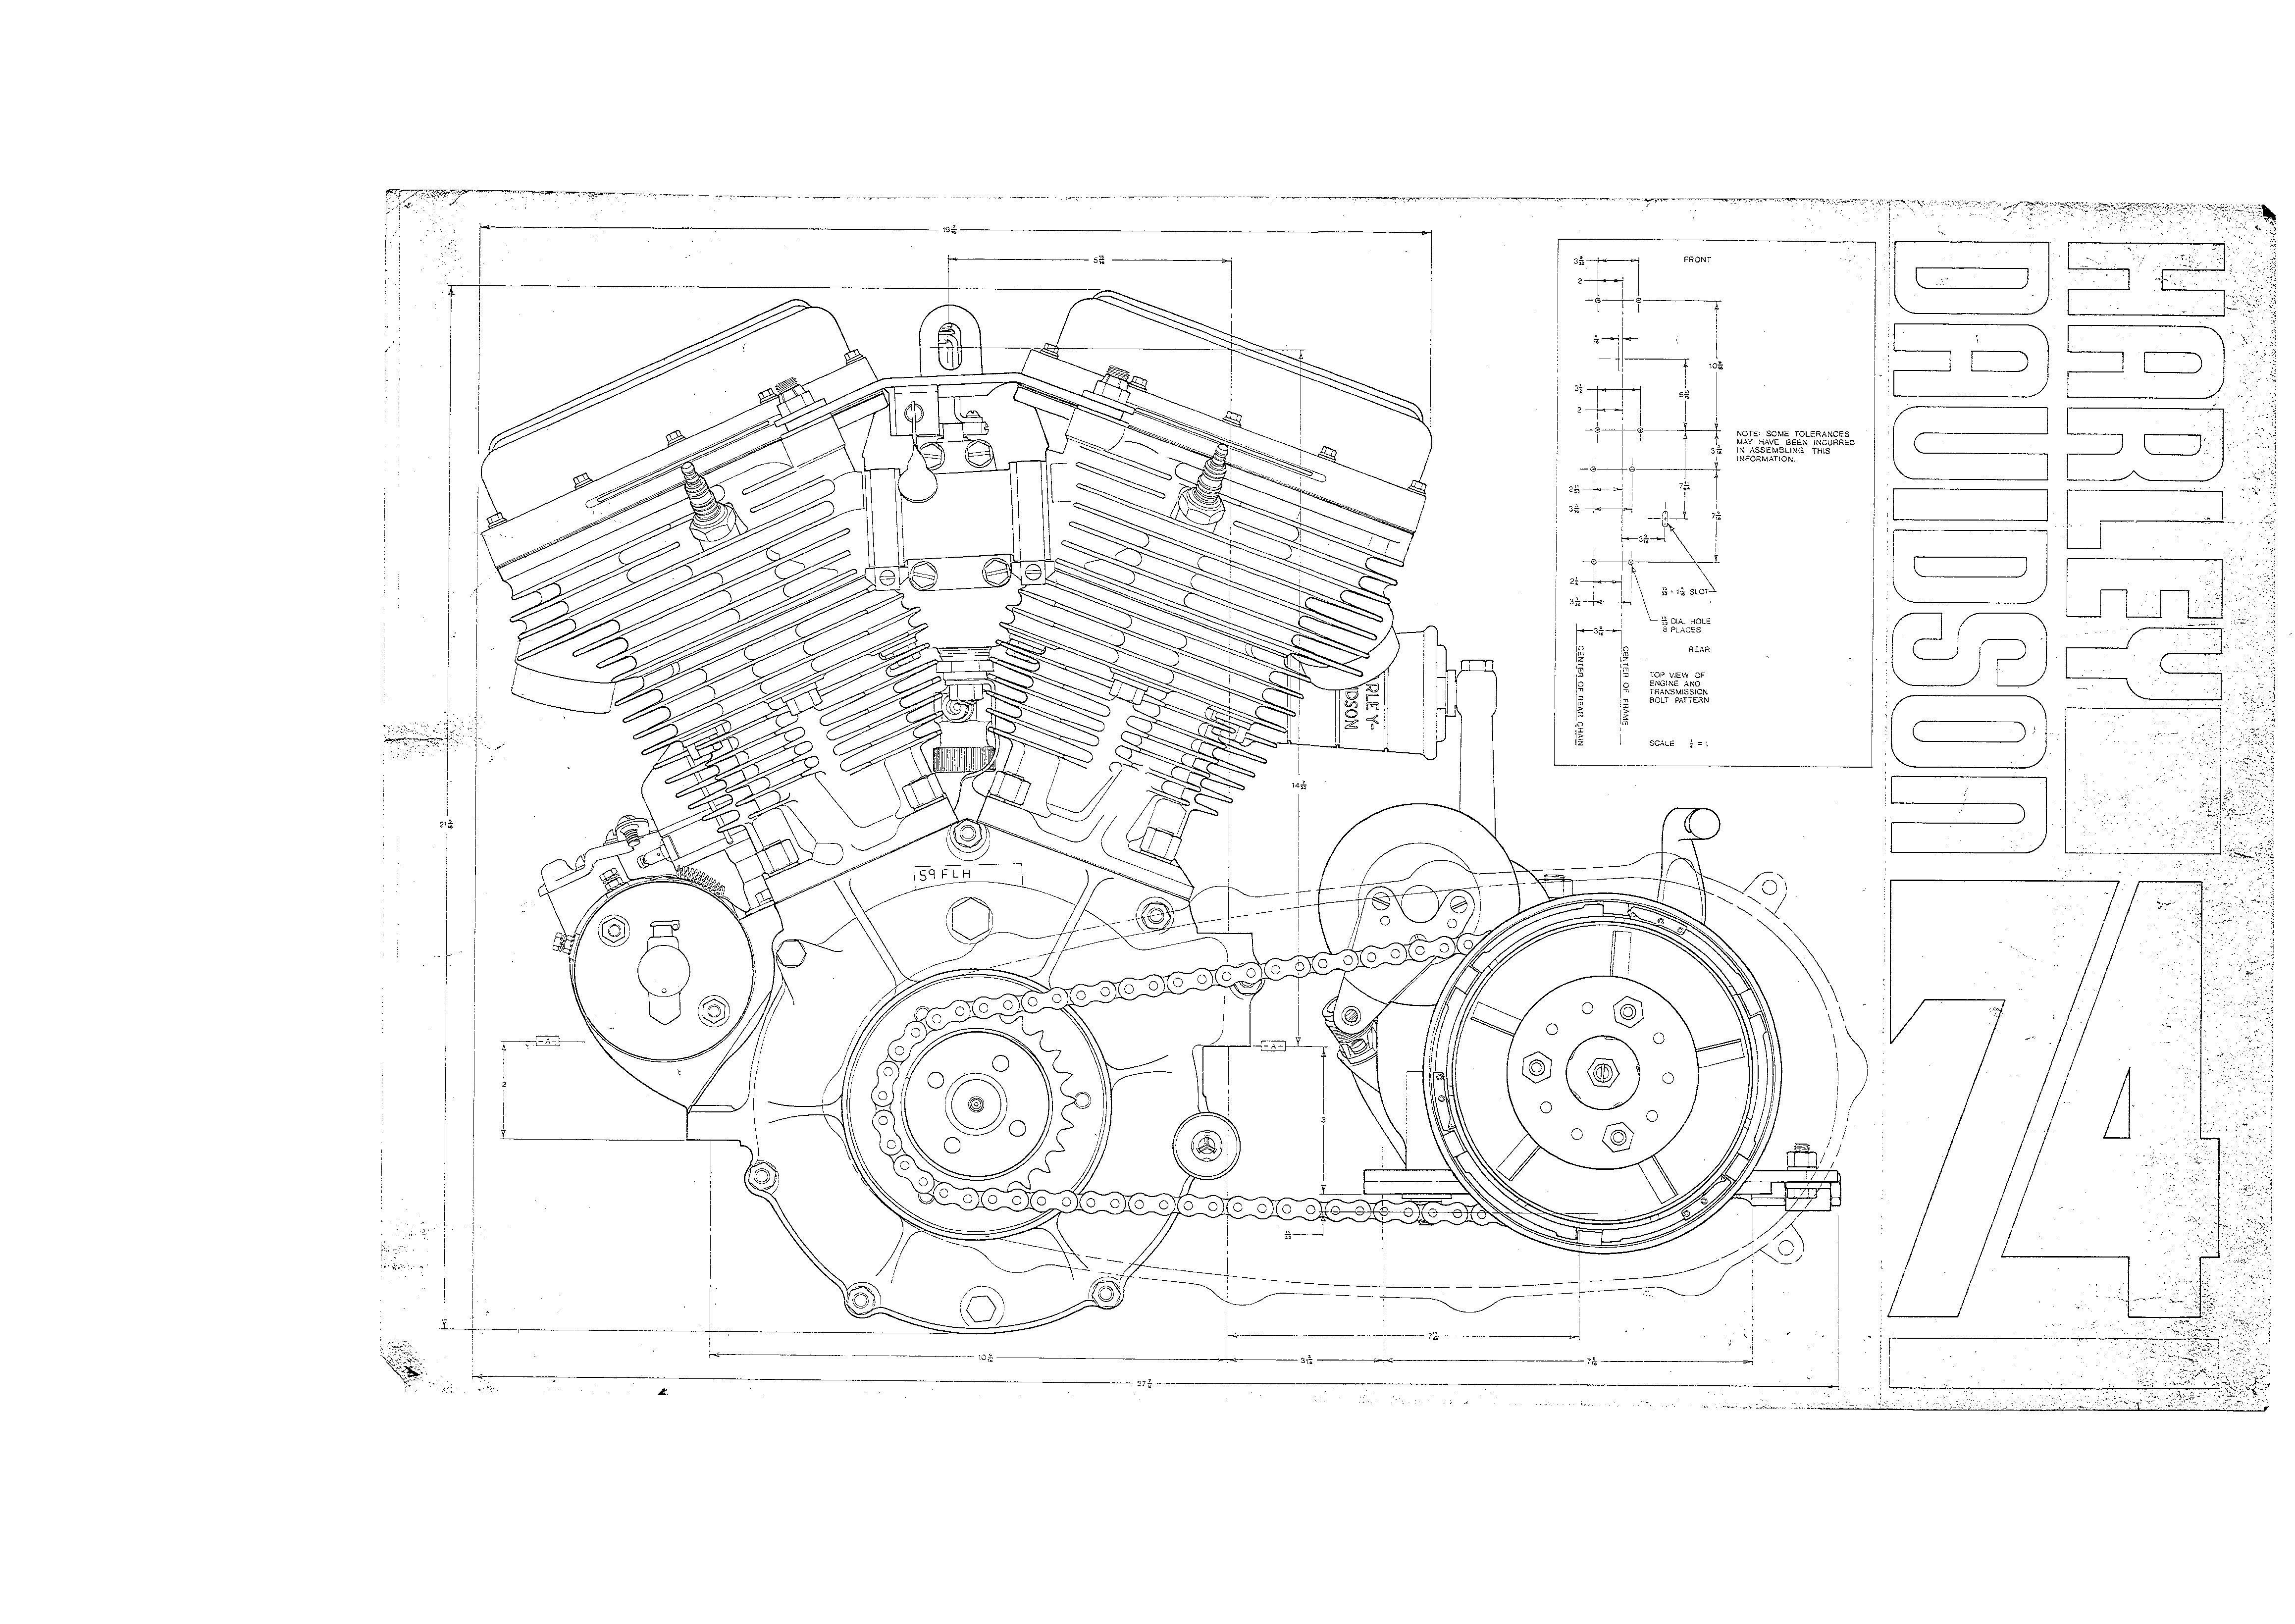 blueprints of engine transmission and frame the panhead motor left image